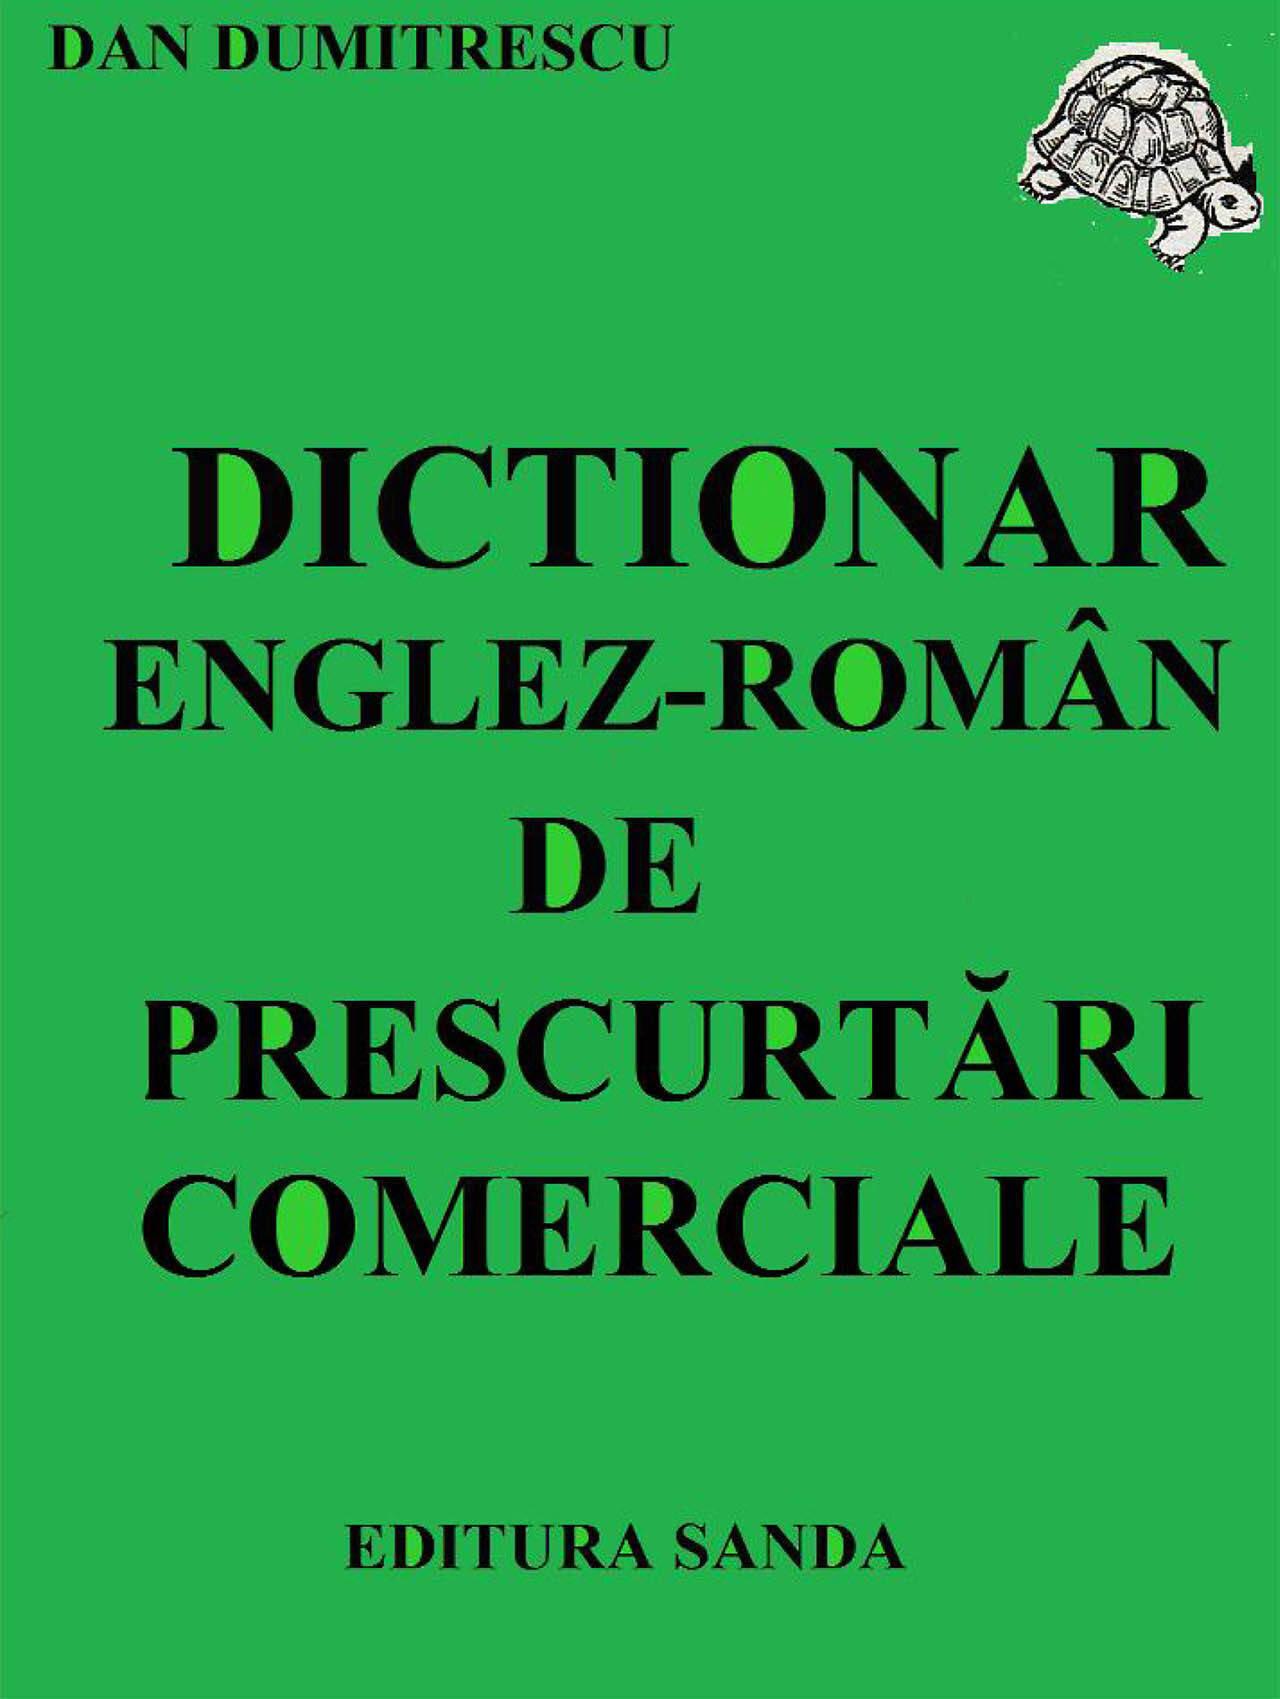 Dictionar Englez-Roman de prescurtari comerciale (eBook)